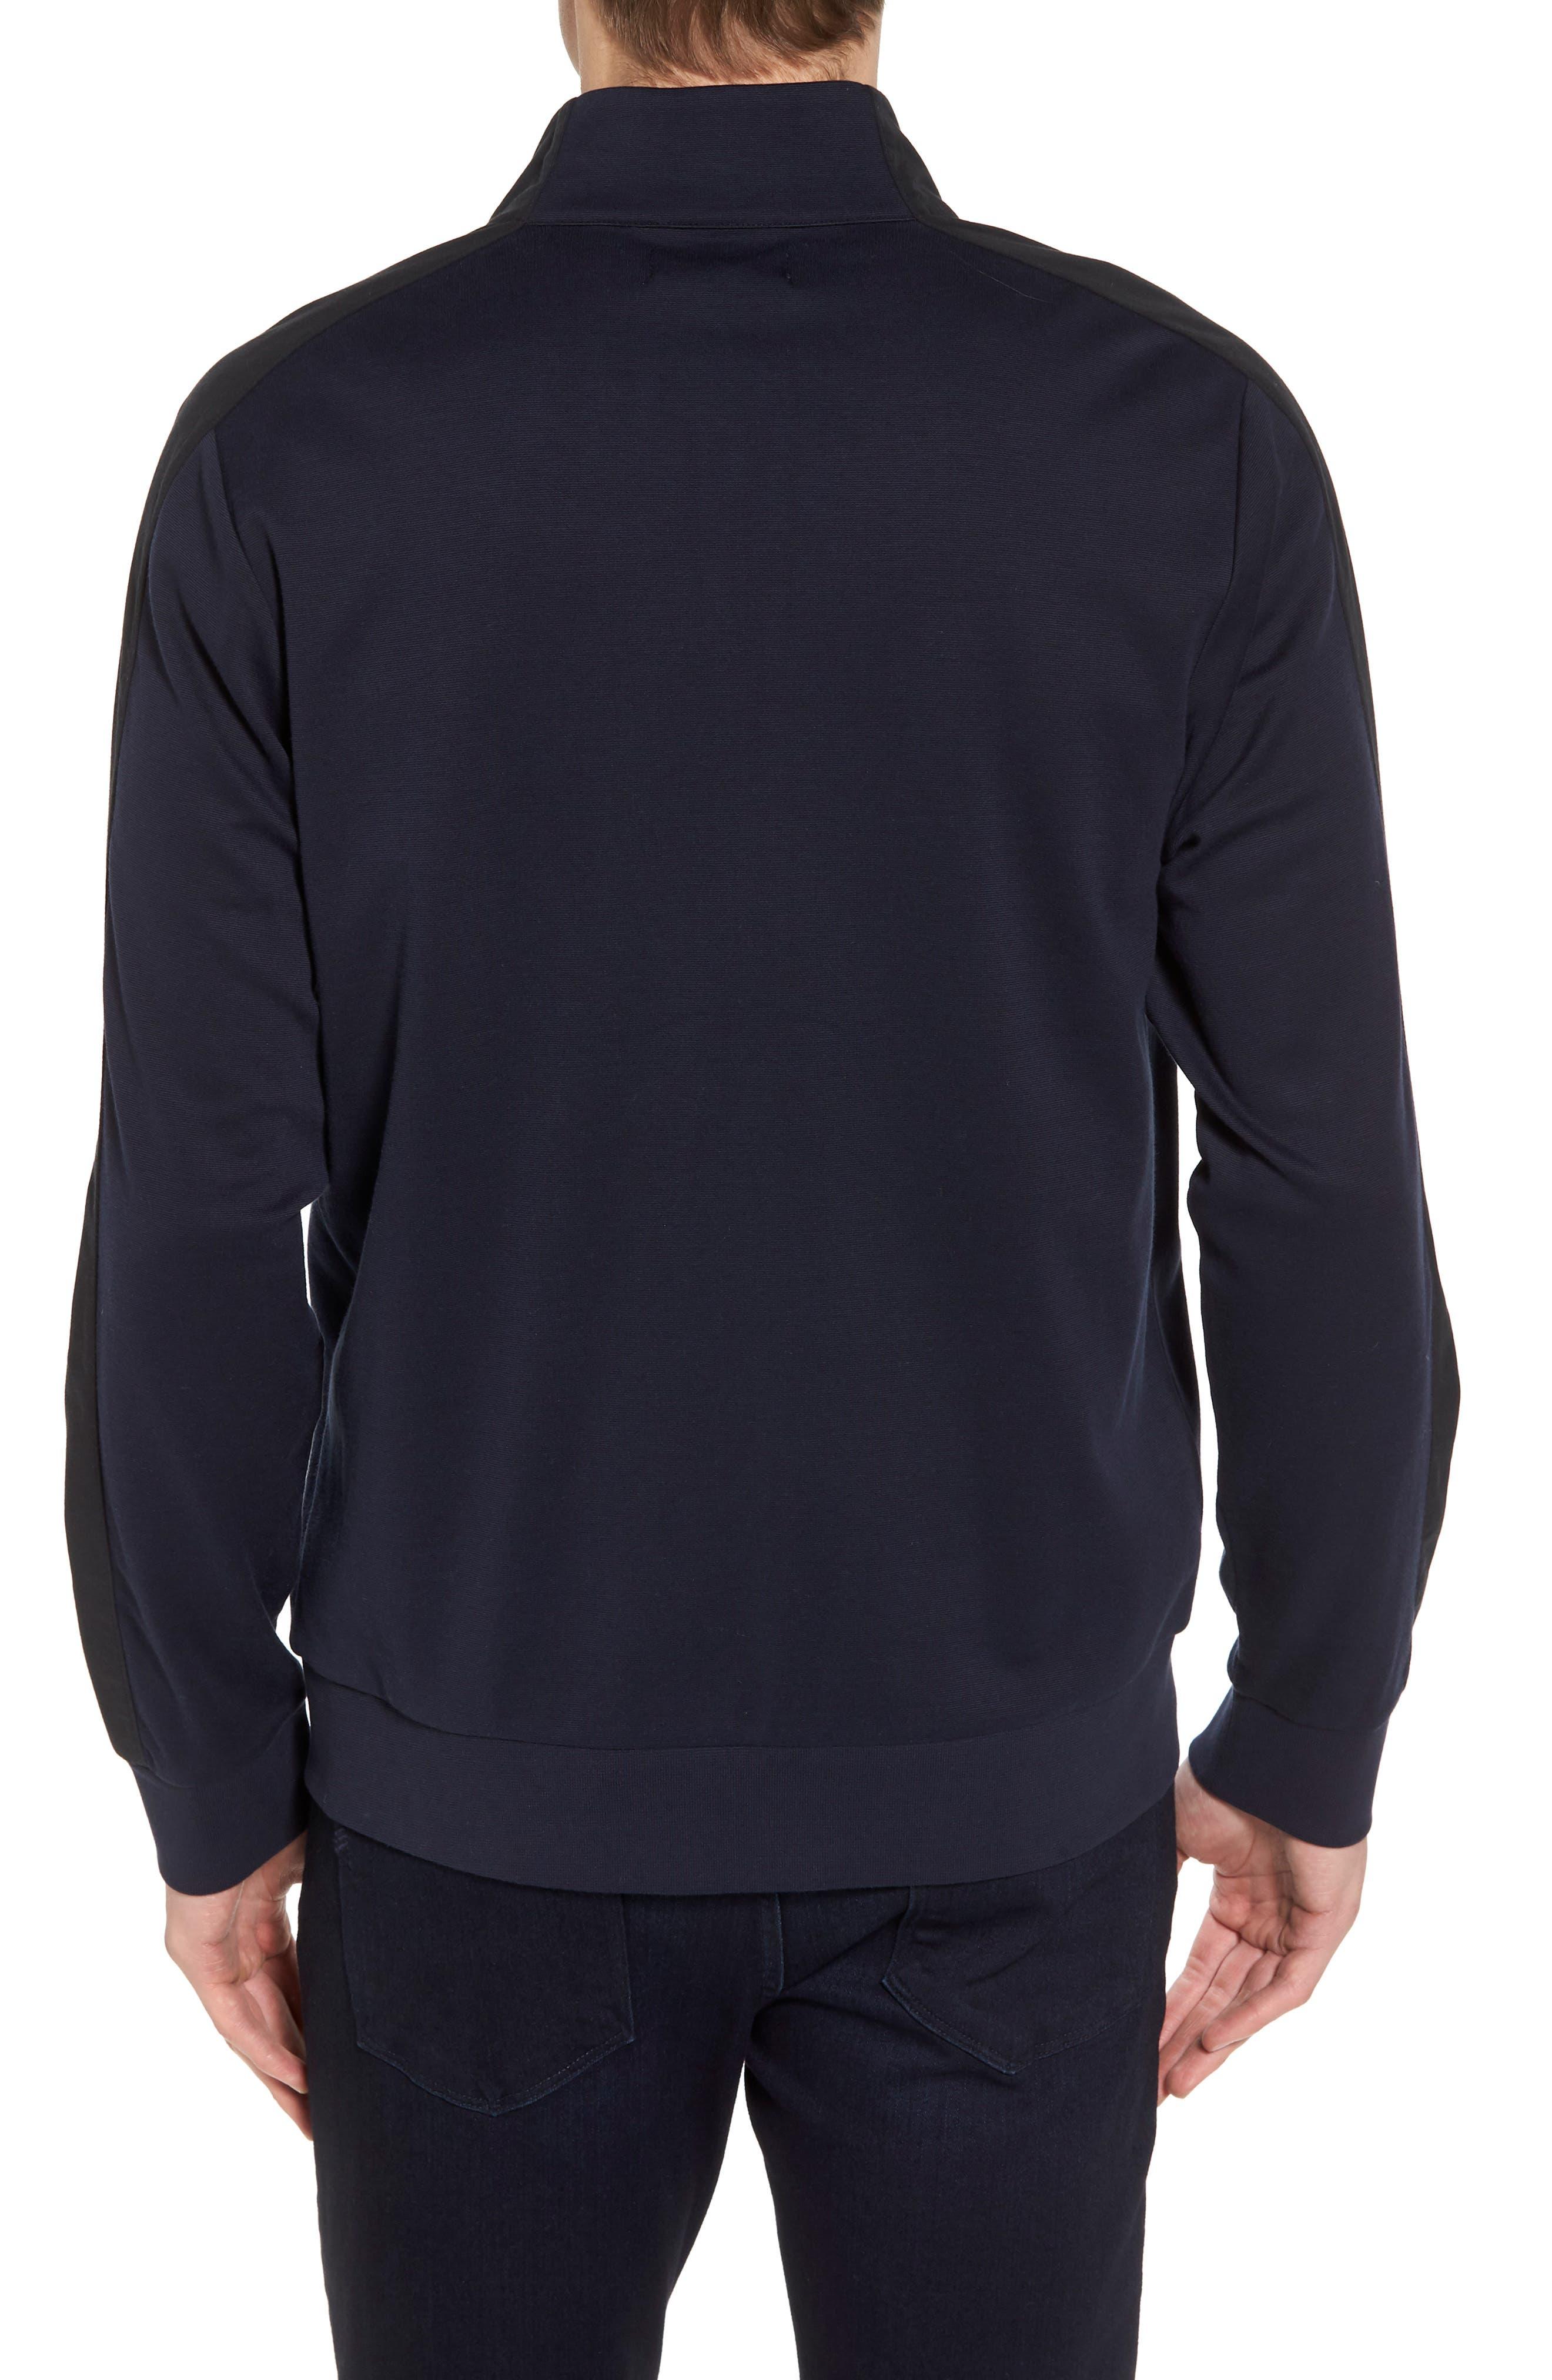 Fleece Jacket,                             Alternate thumbnail 2, color,                             Navy Night Black